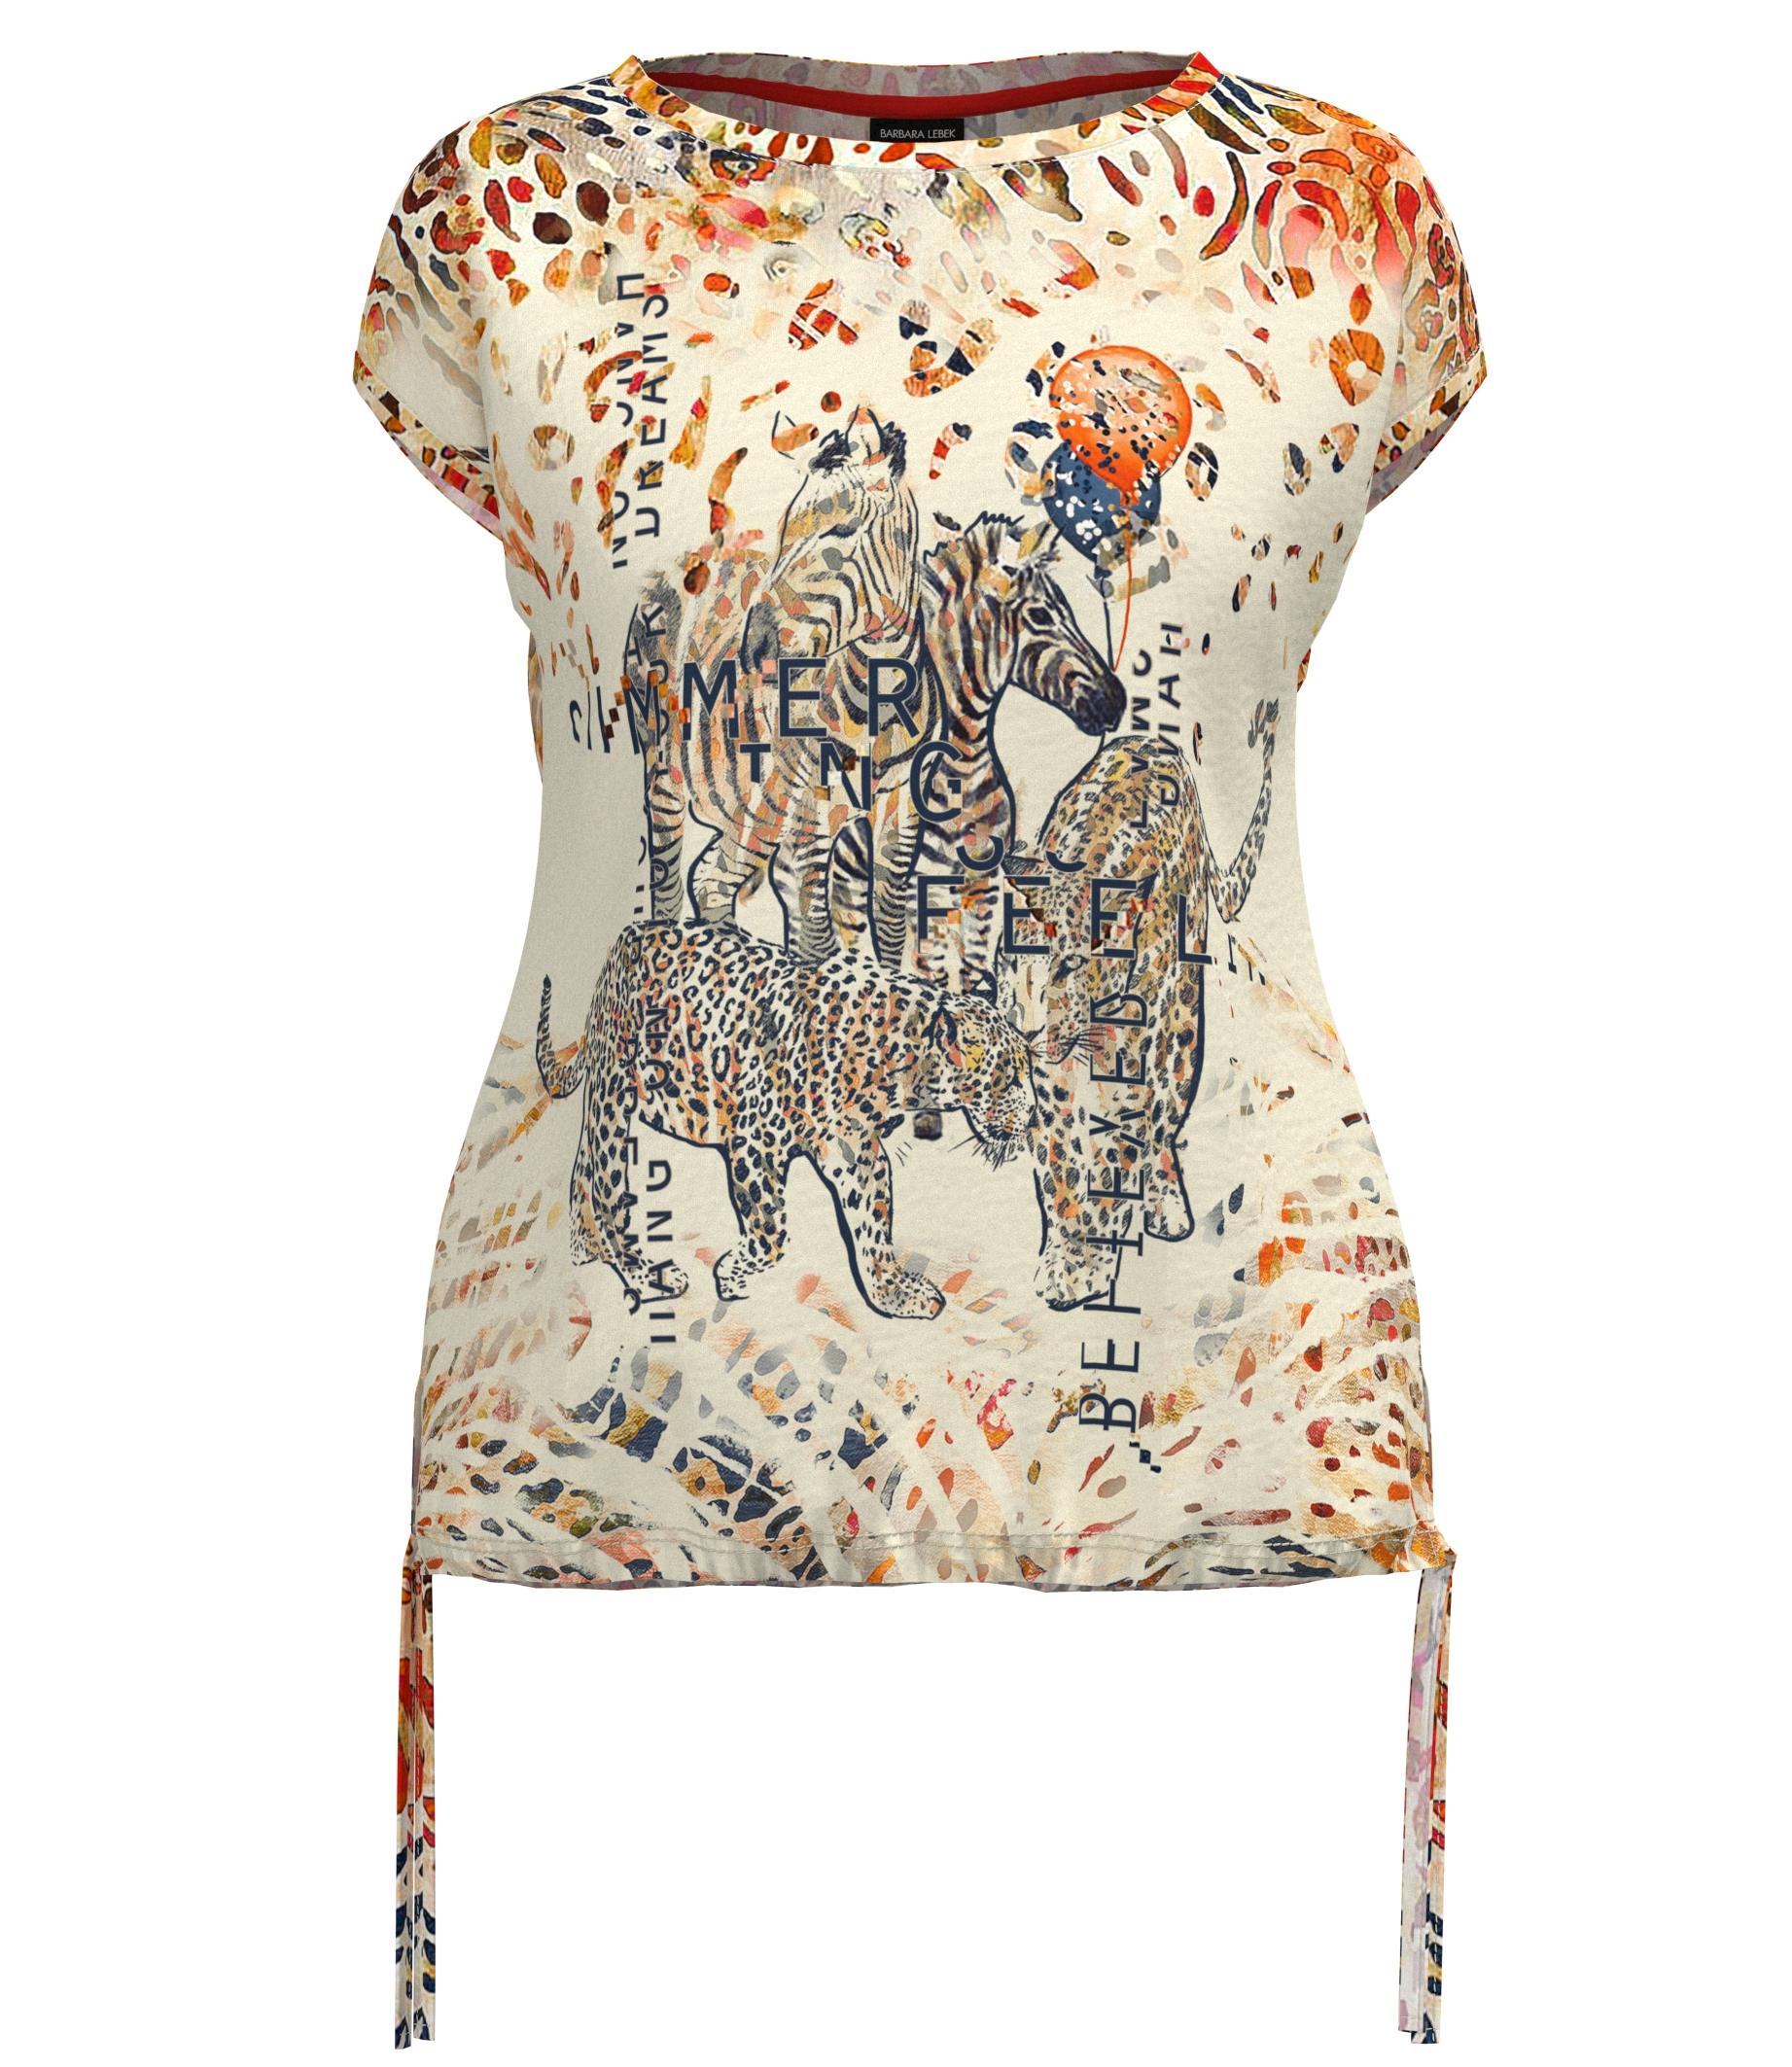 Monari kurzarm Shirt mit animal Druck orange